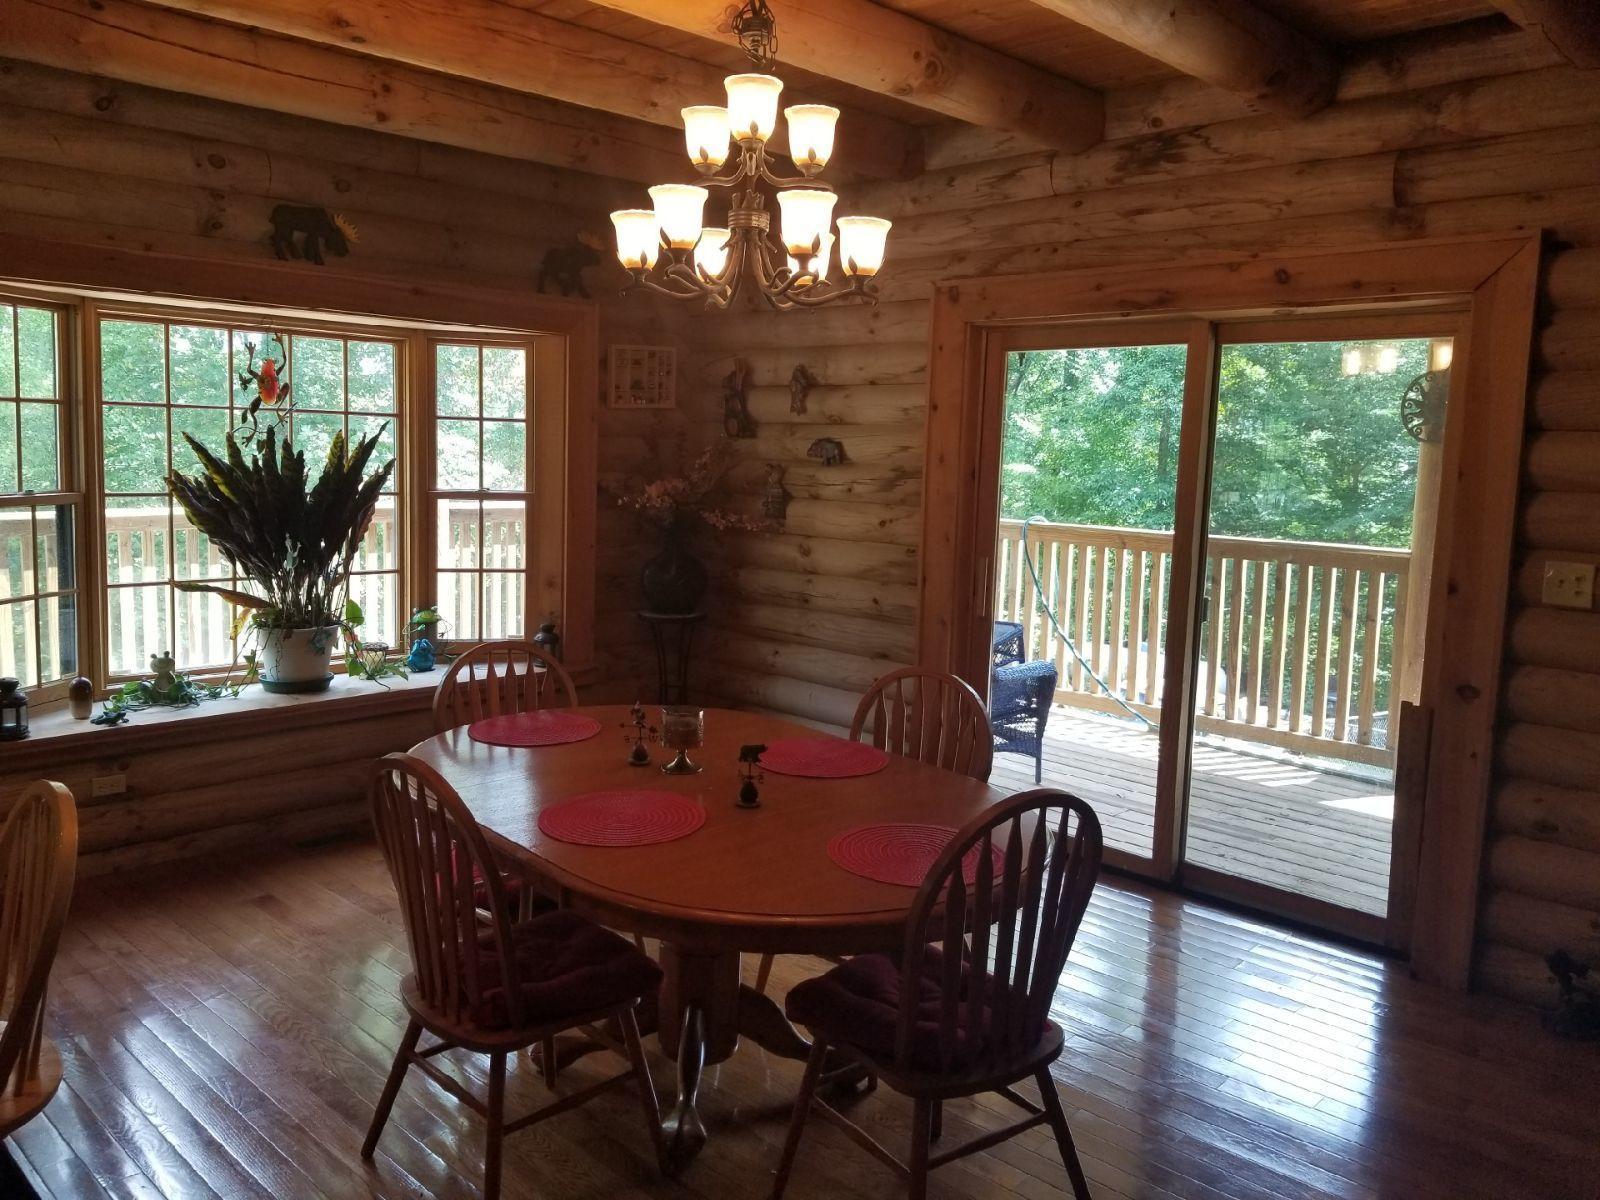 225 Kiowa, Del Rio, Tennessee, United States 37727, 3 Bedrooms Bedrooms, ,3 BathroomsBathrooms,Single Family,For Sale,Kiowa,1057293